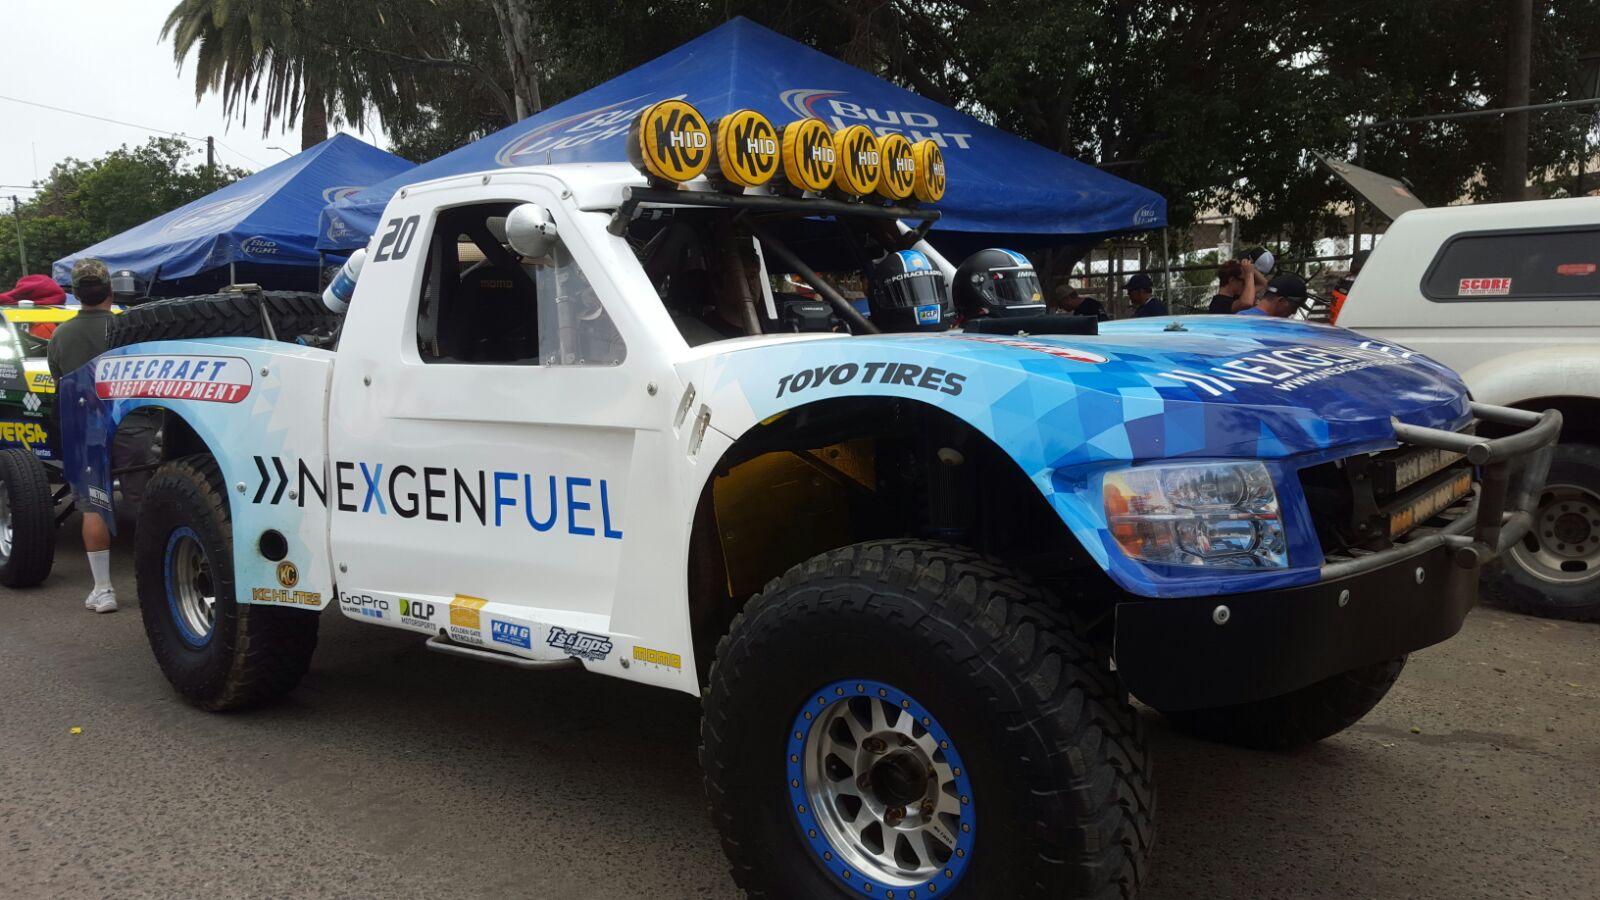 Sell my motorcycle florida baja fernando ferreyra blue truck - Sell ...